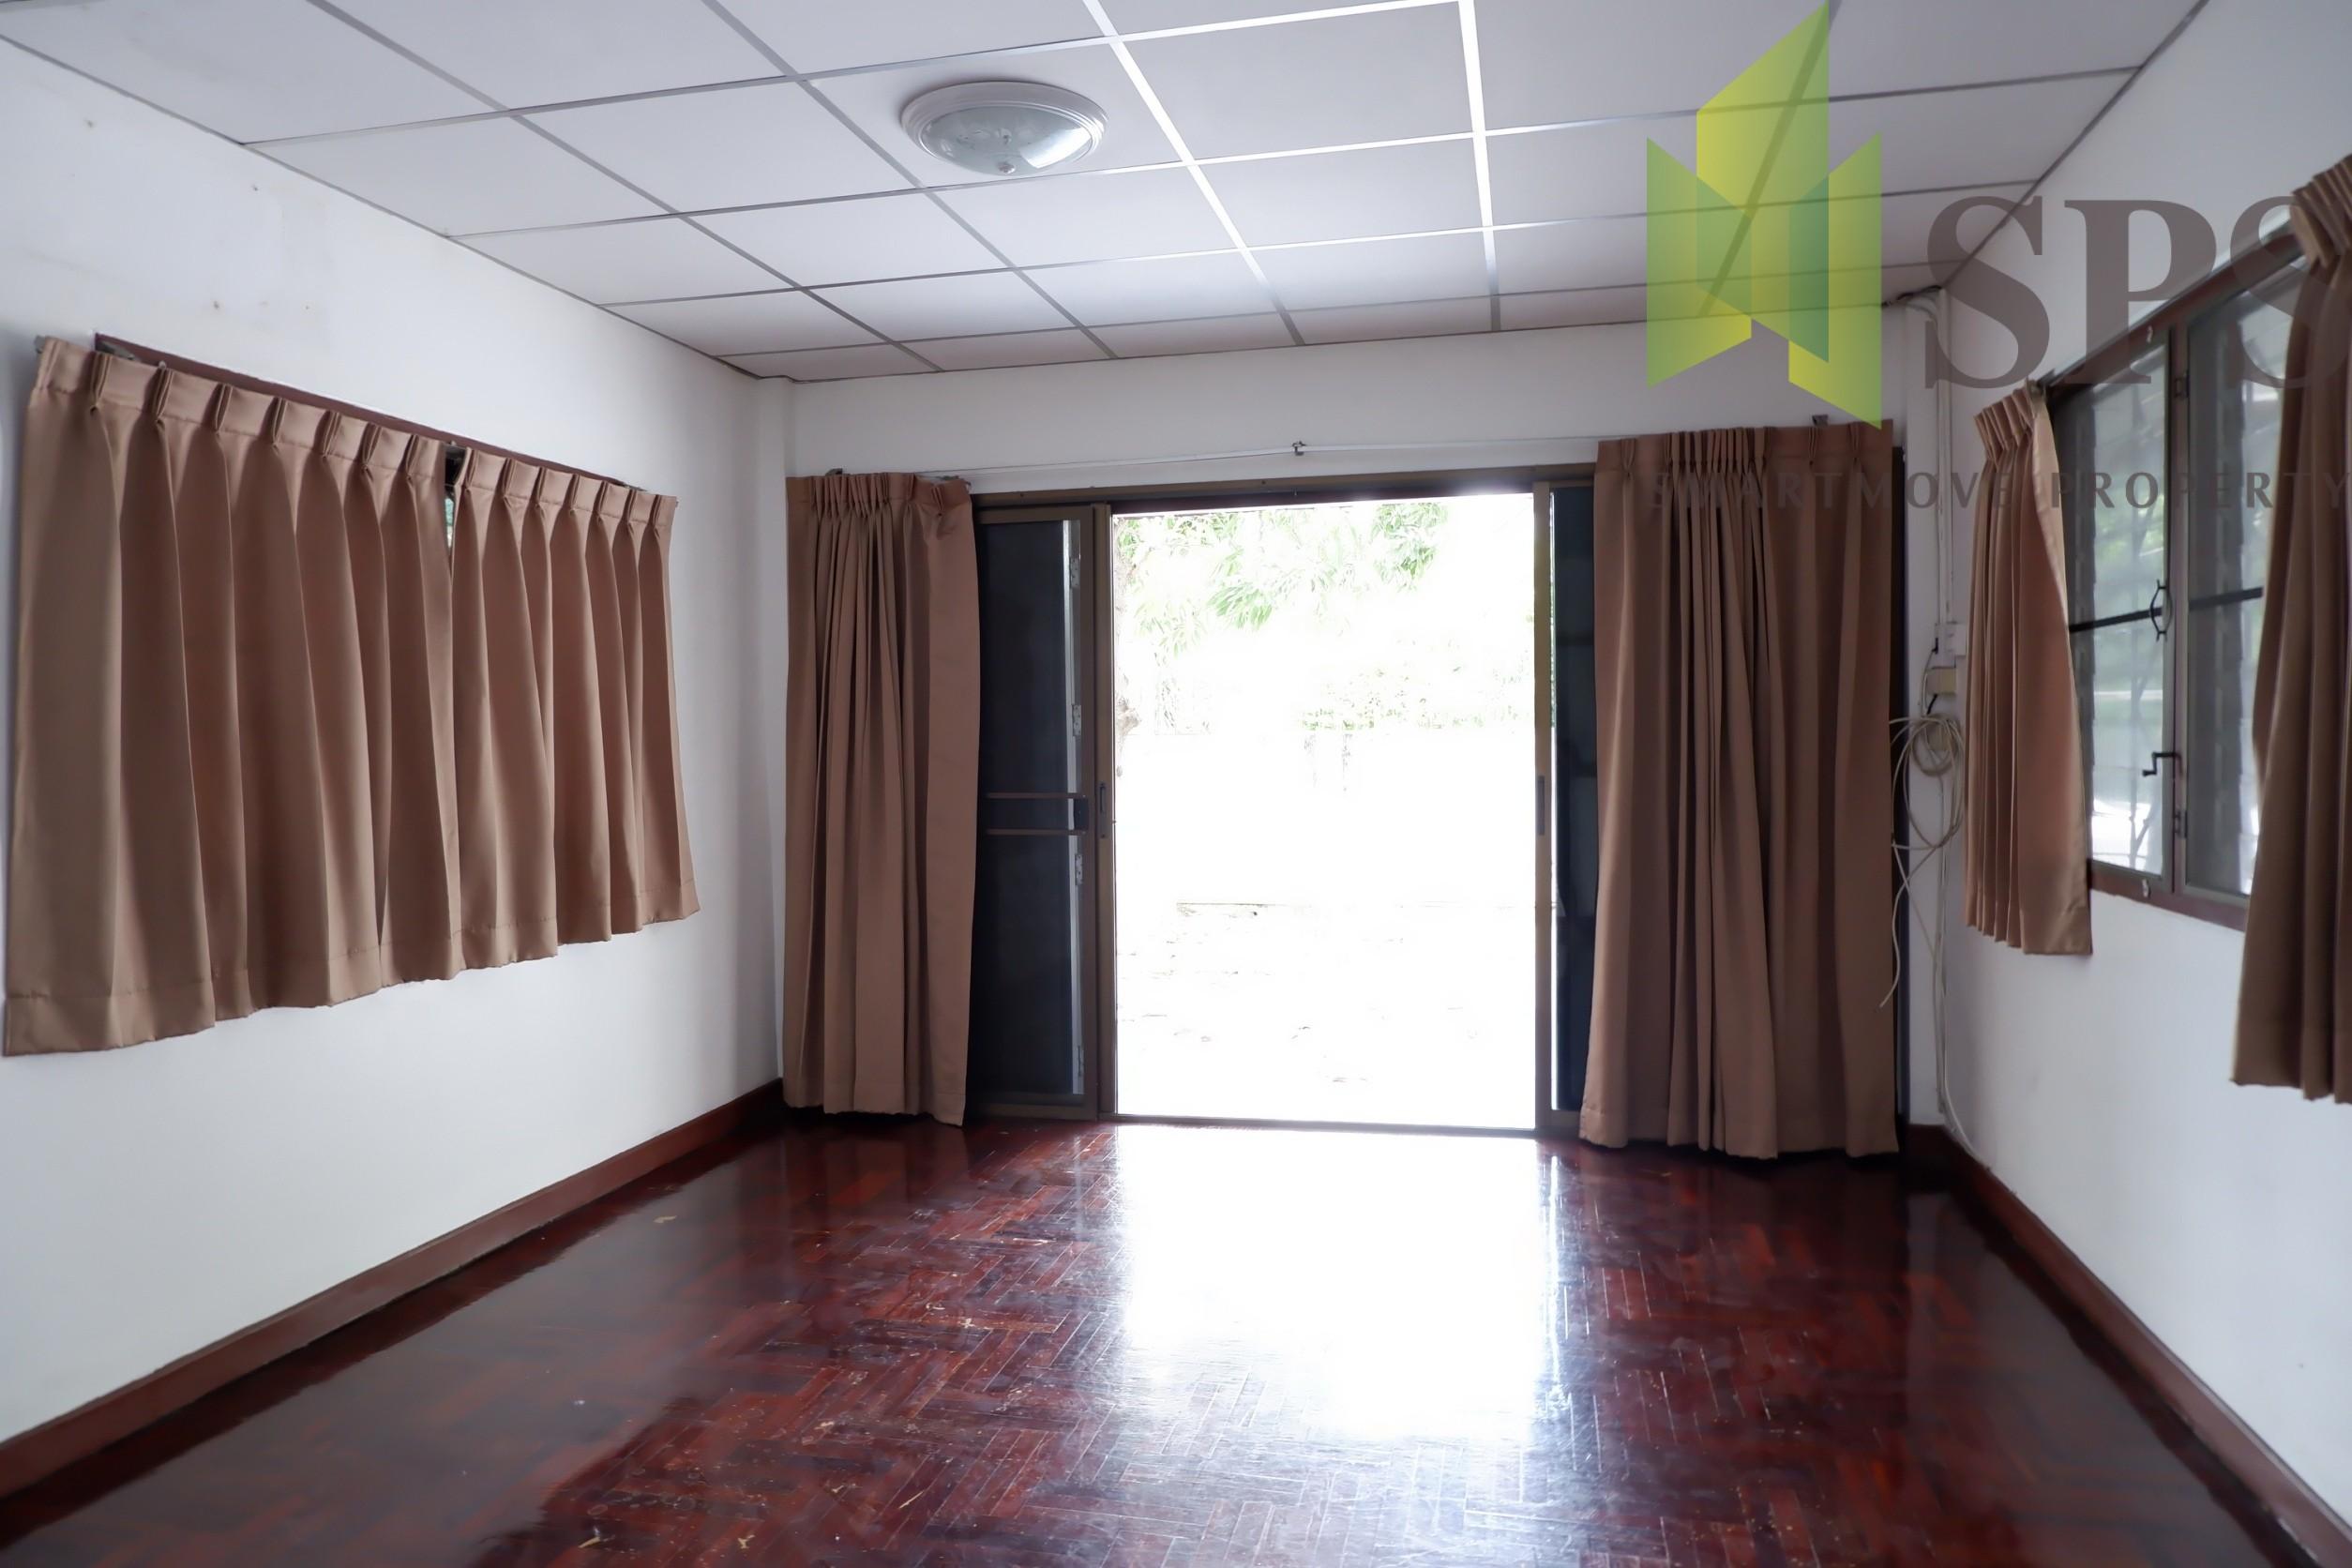 Detached house Bangnavilla Bangna-Trad39 หมู่บ้านบางนา วิลล่า (SPS-GH1004)